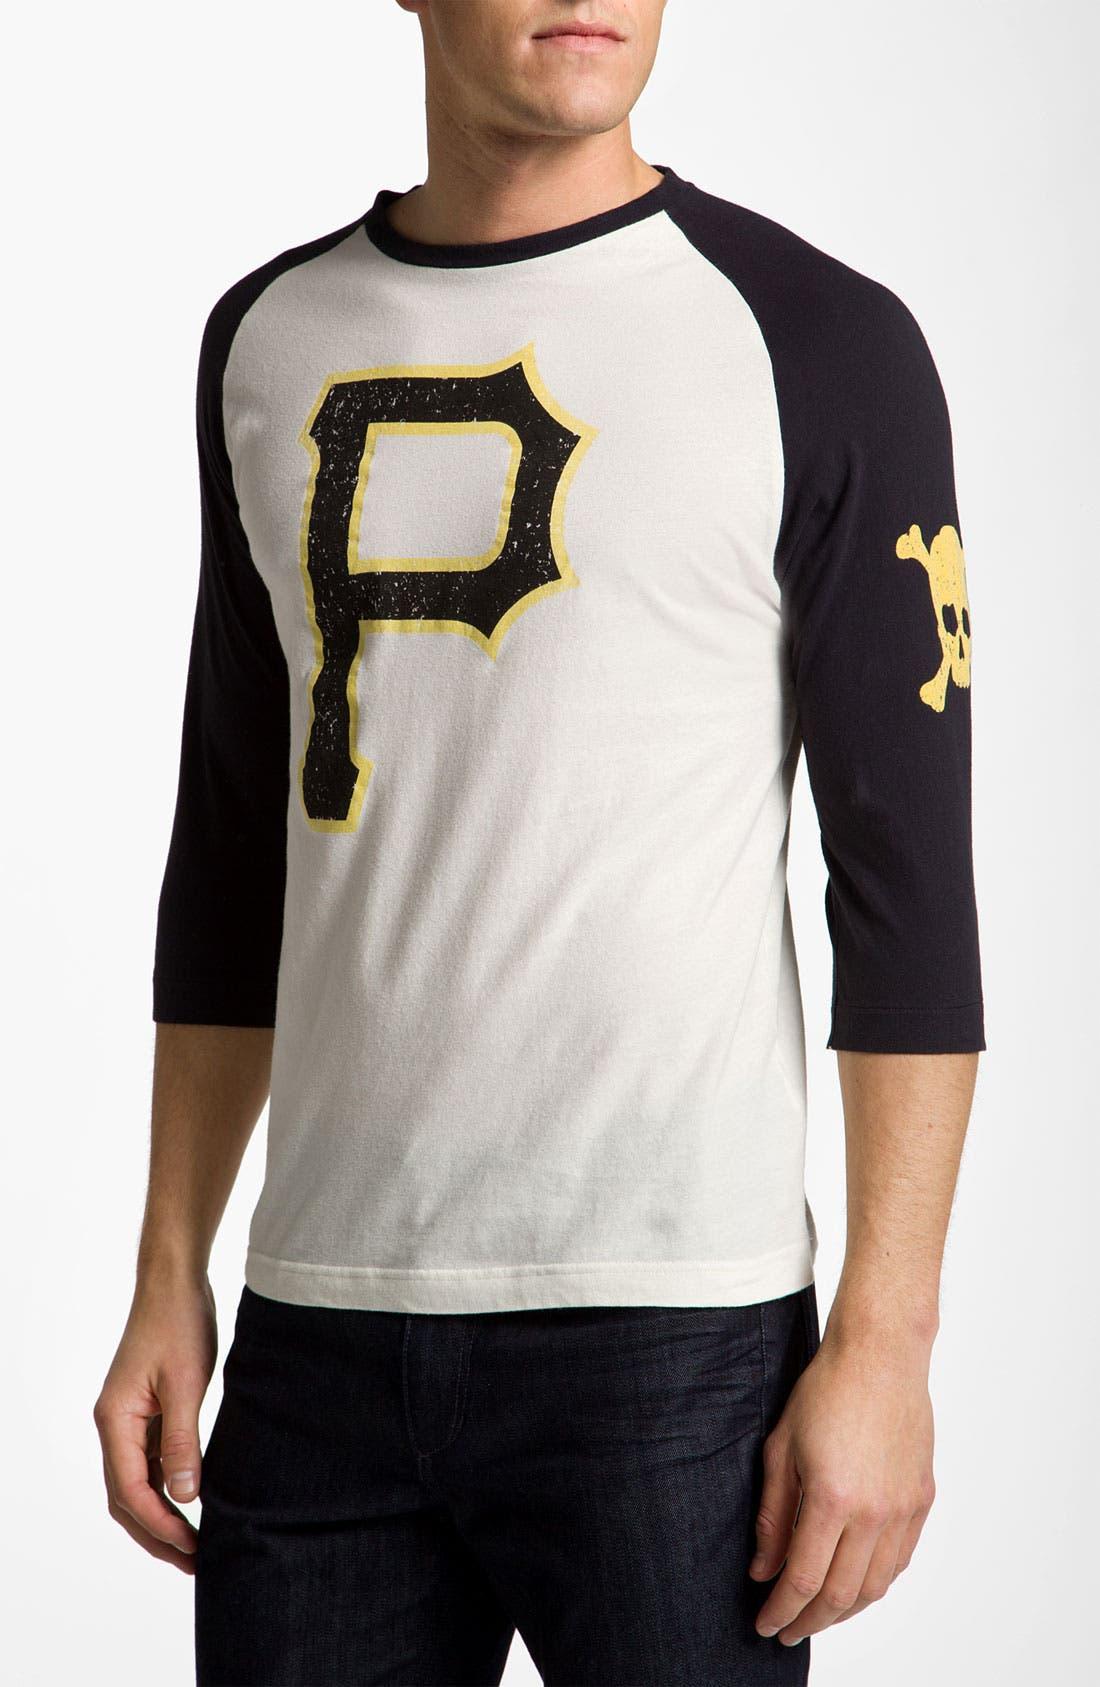 Alternate Image 1 Selected - Wright & Ditson 'Pittsburgh Pirates' Baseball T-Shirt